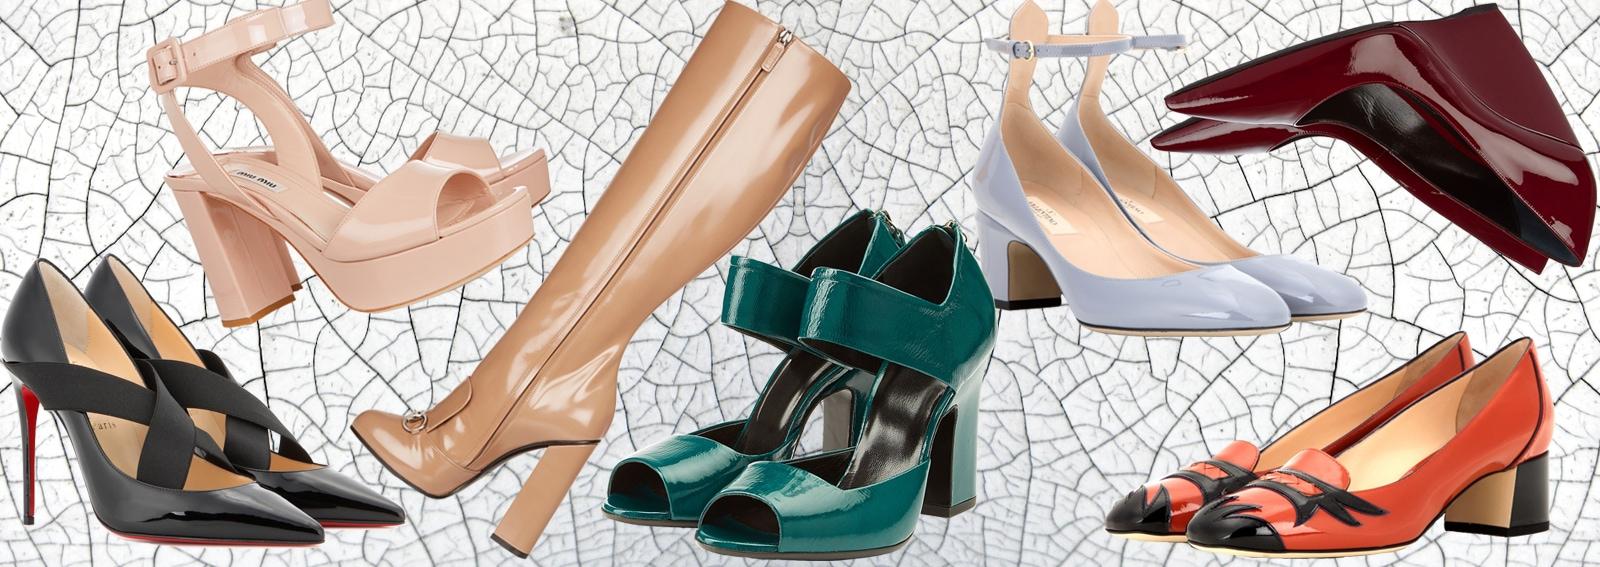 cover scarpe vernice inverno 2015 desktop